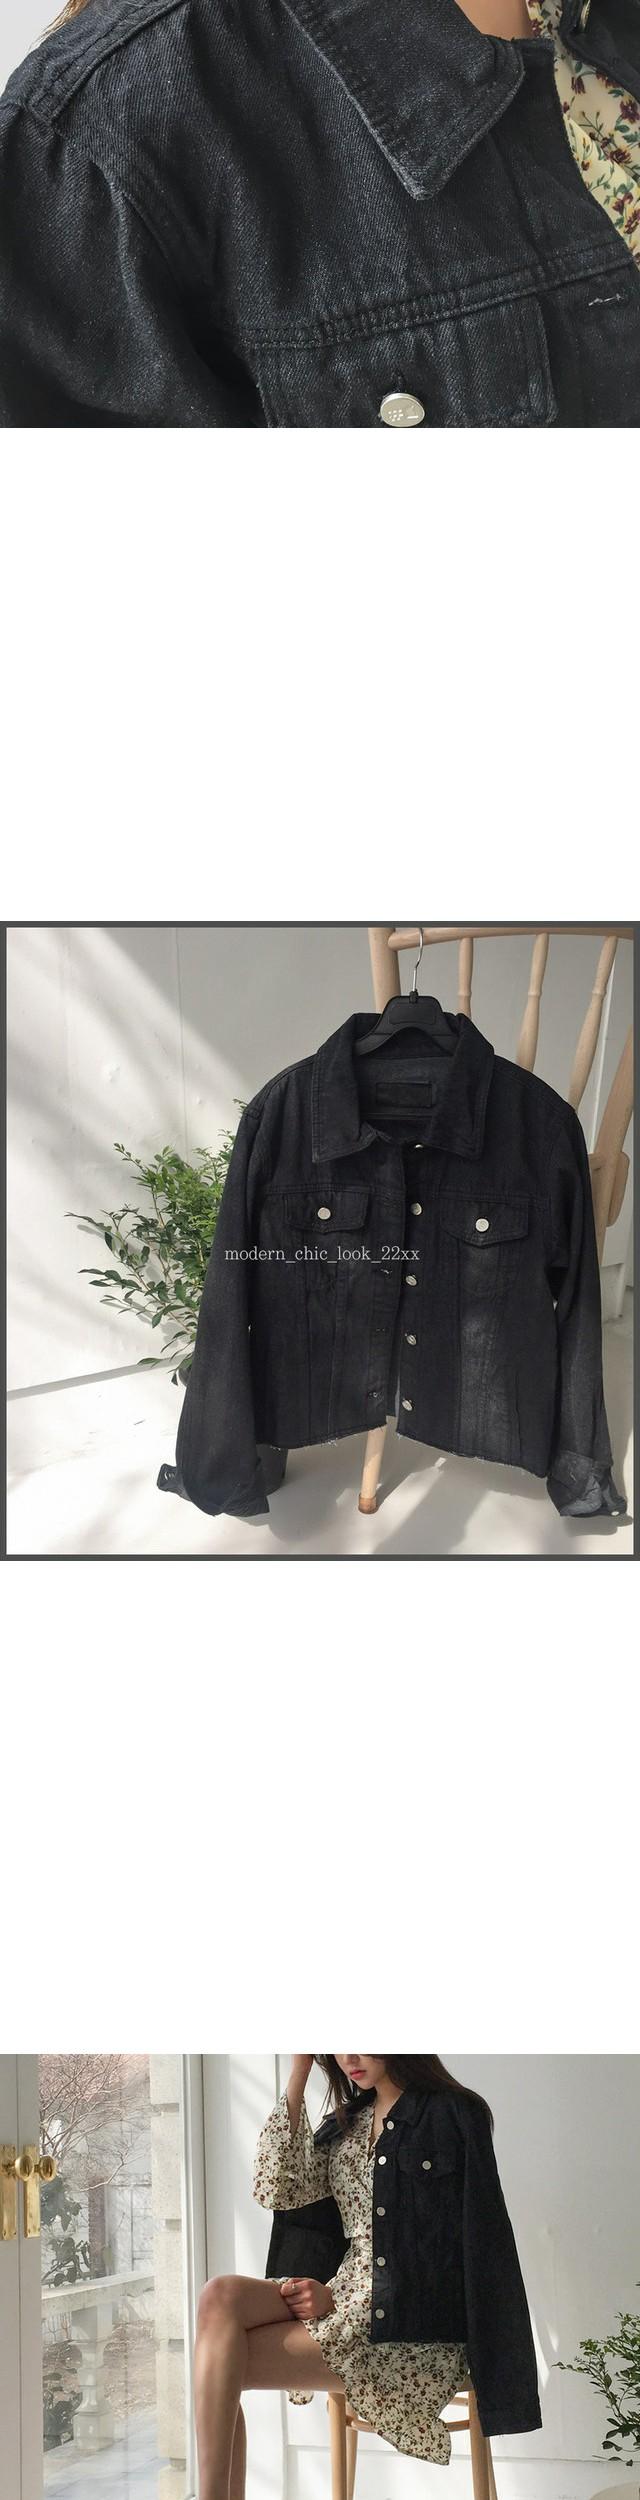 Den denim jacket